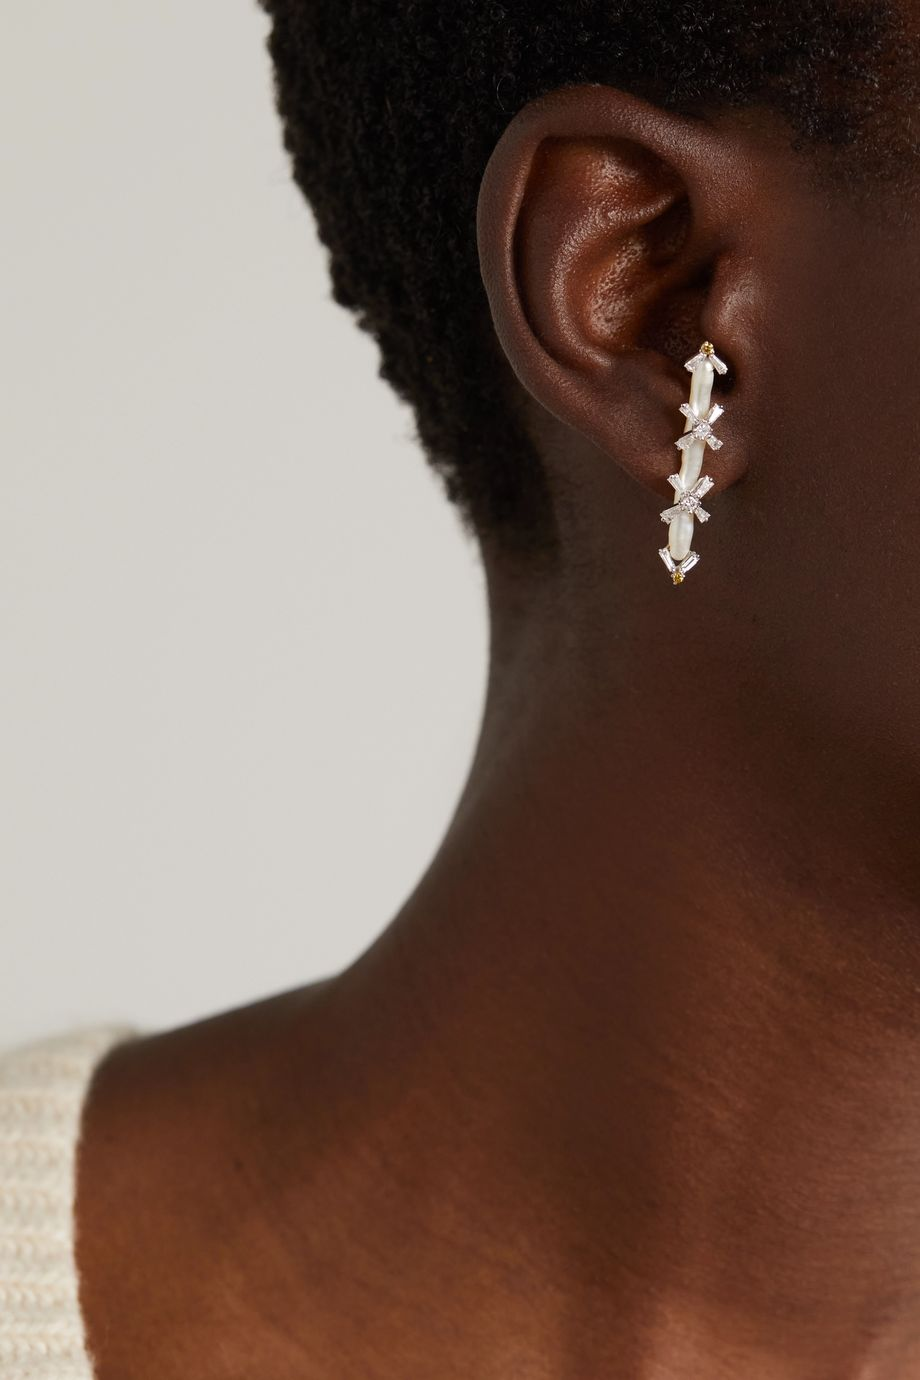 Bina Goenka Boucles d'oreilles en or blanc 18 carats, perles et diamants